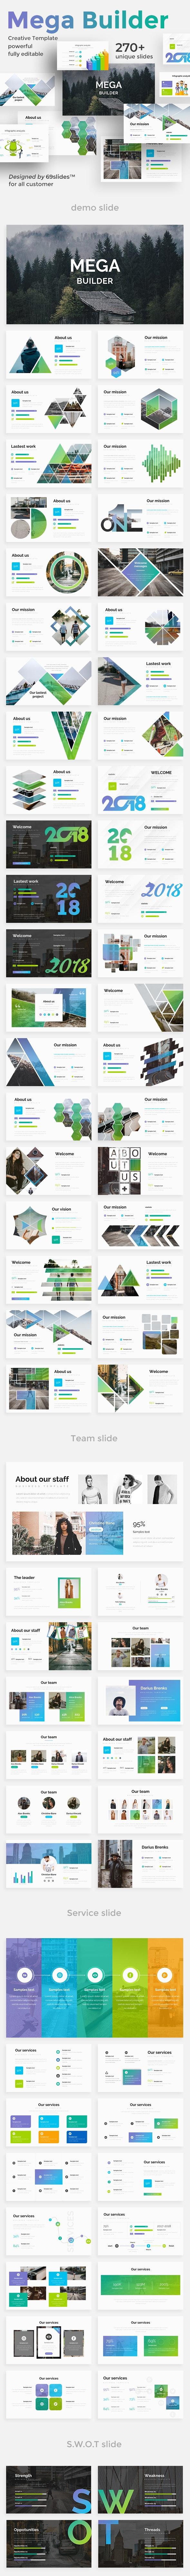 Mega Builder Proposal Keynote Template - Business Keynote Templates